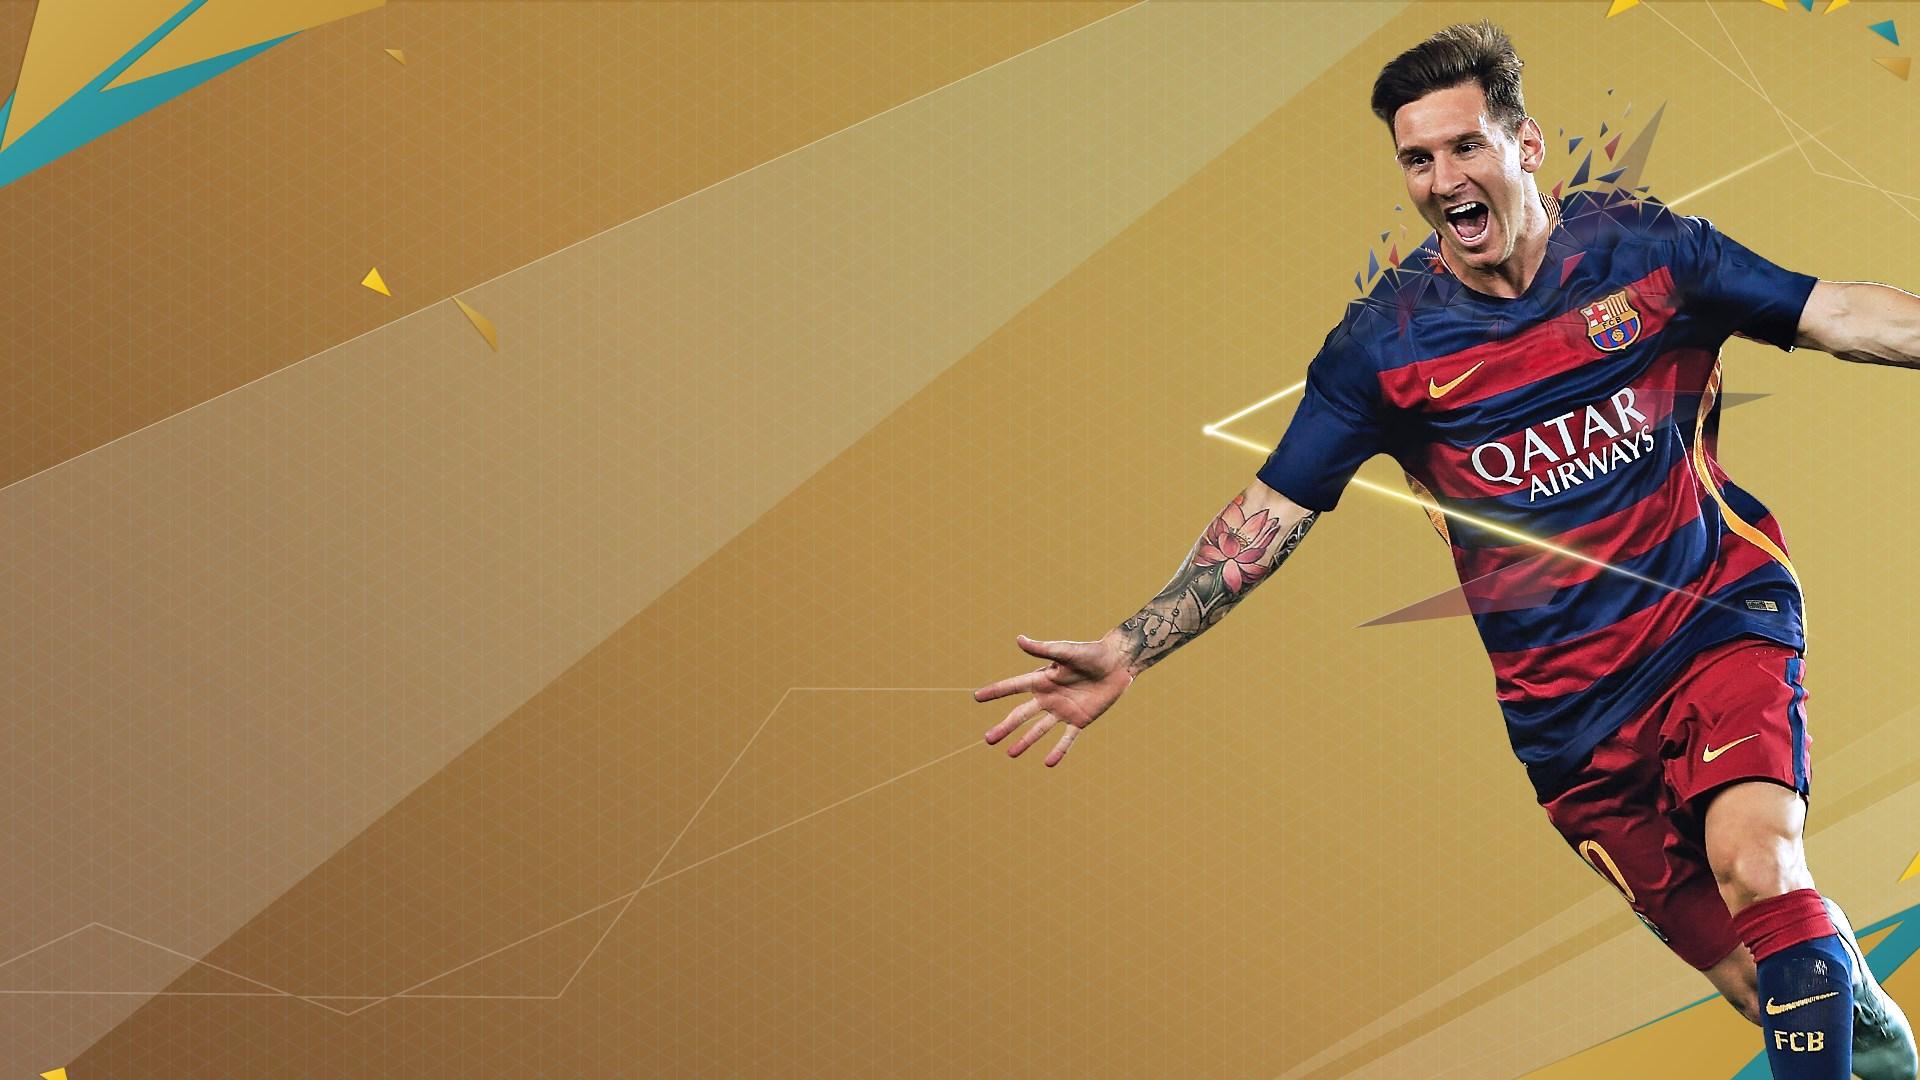 2,200 FIFA 16 Points